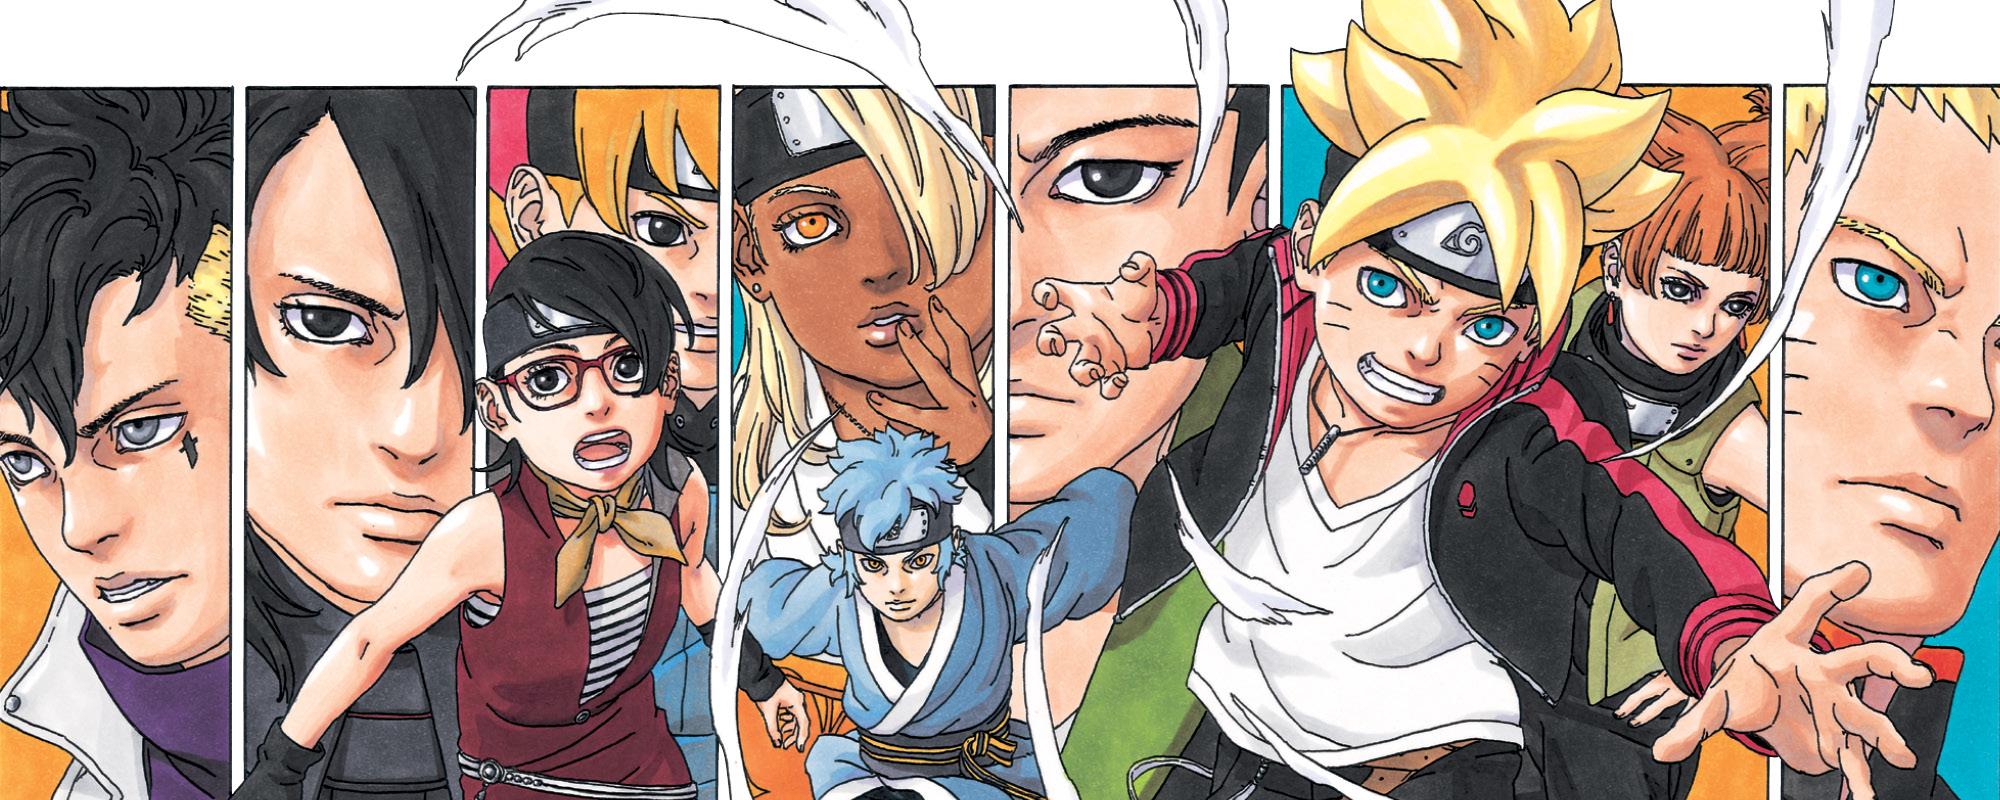 Boruto: Naruto Next Generations Chapitre 55: Date de sortie, spoiler et lire Manga en ligne